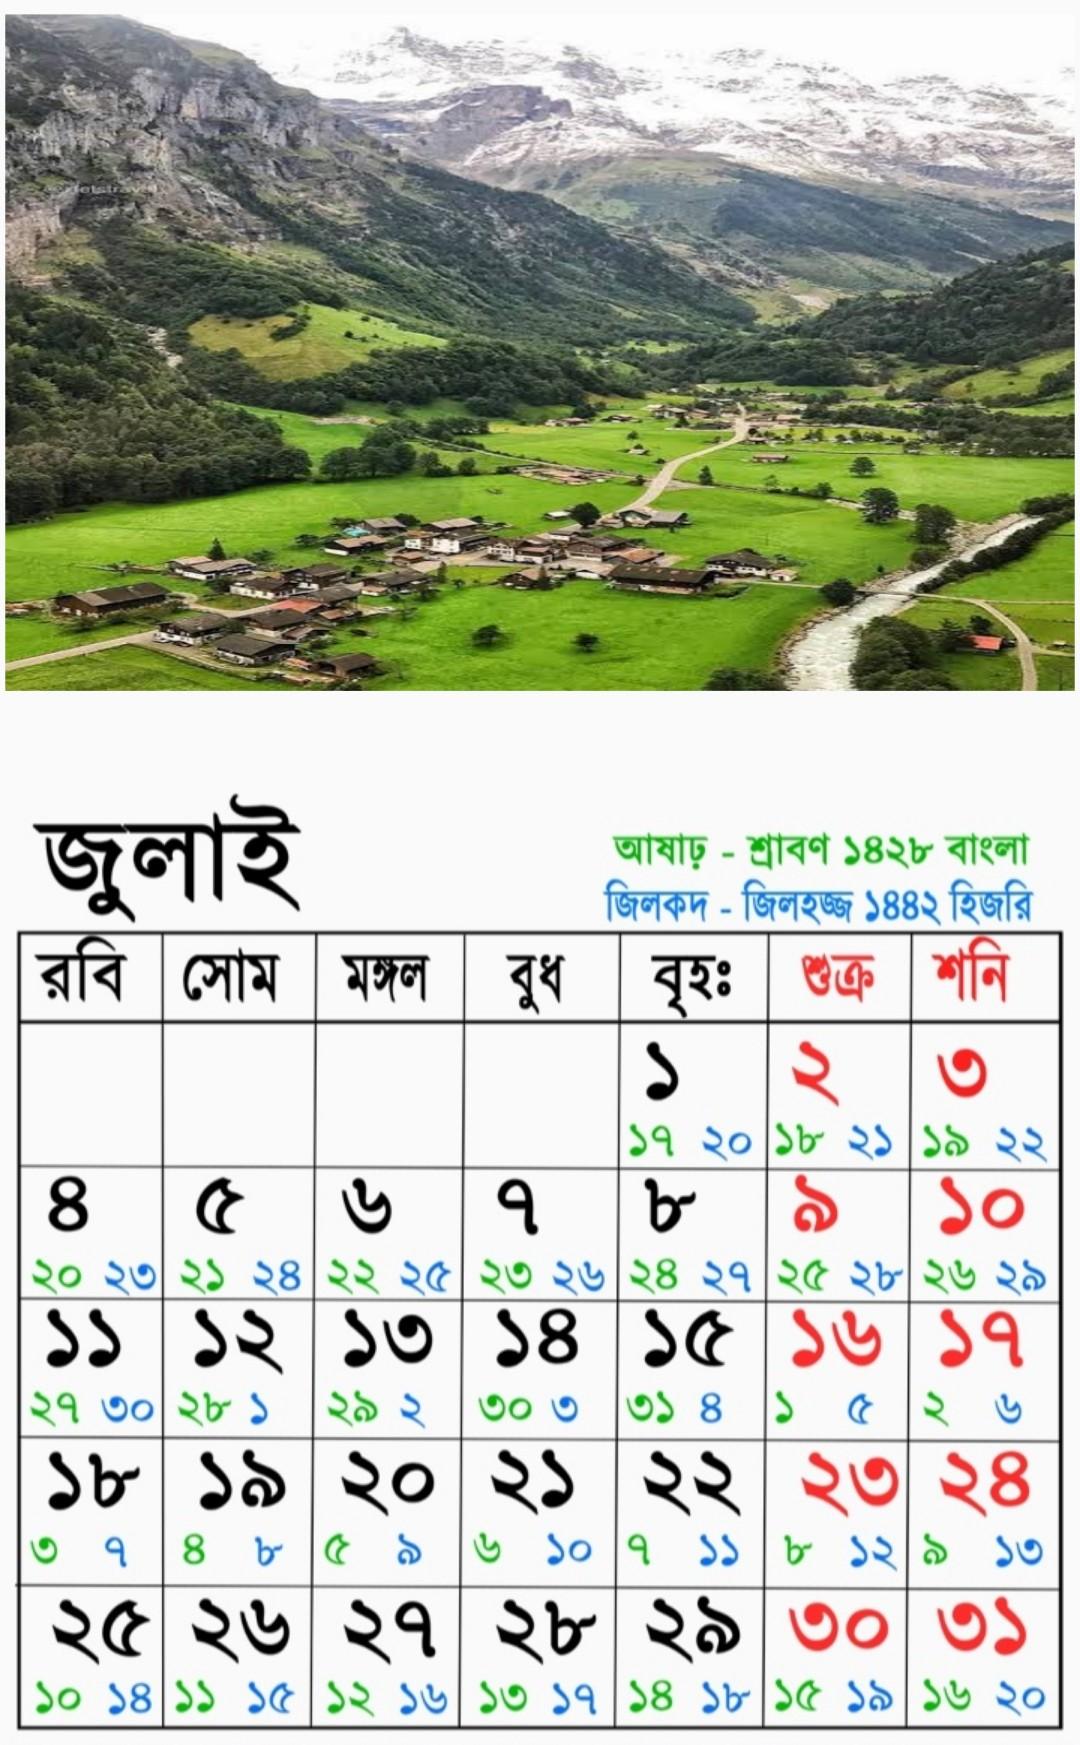 July Bangla English Arabi Calendar 2021 | জুলাই বাংলা ইংরেজি আরবি ক্যালেন্ডার ২০২১